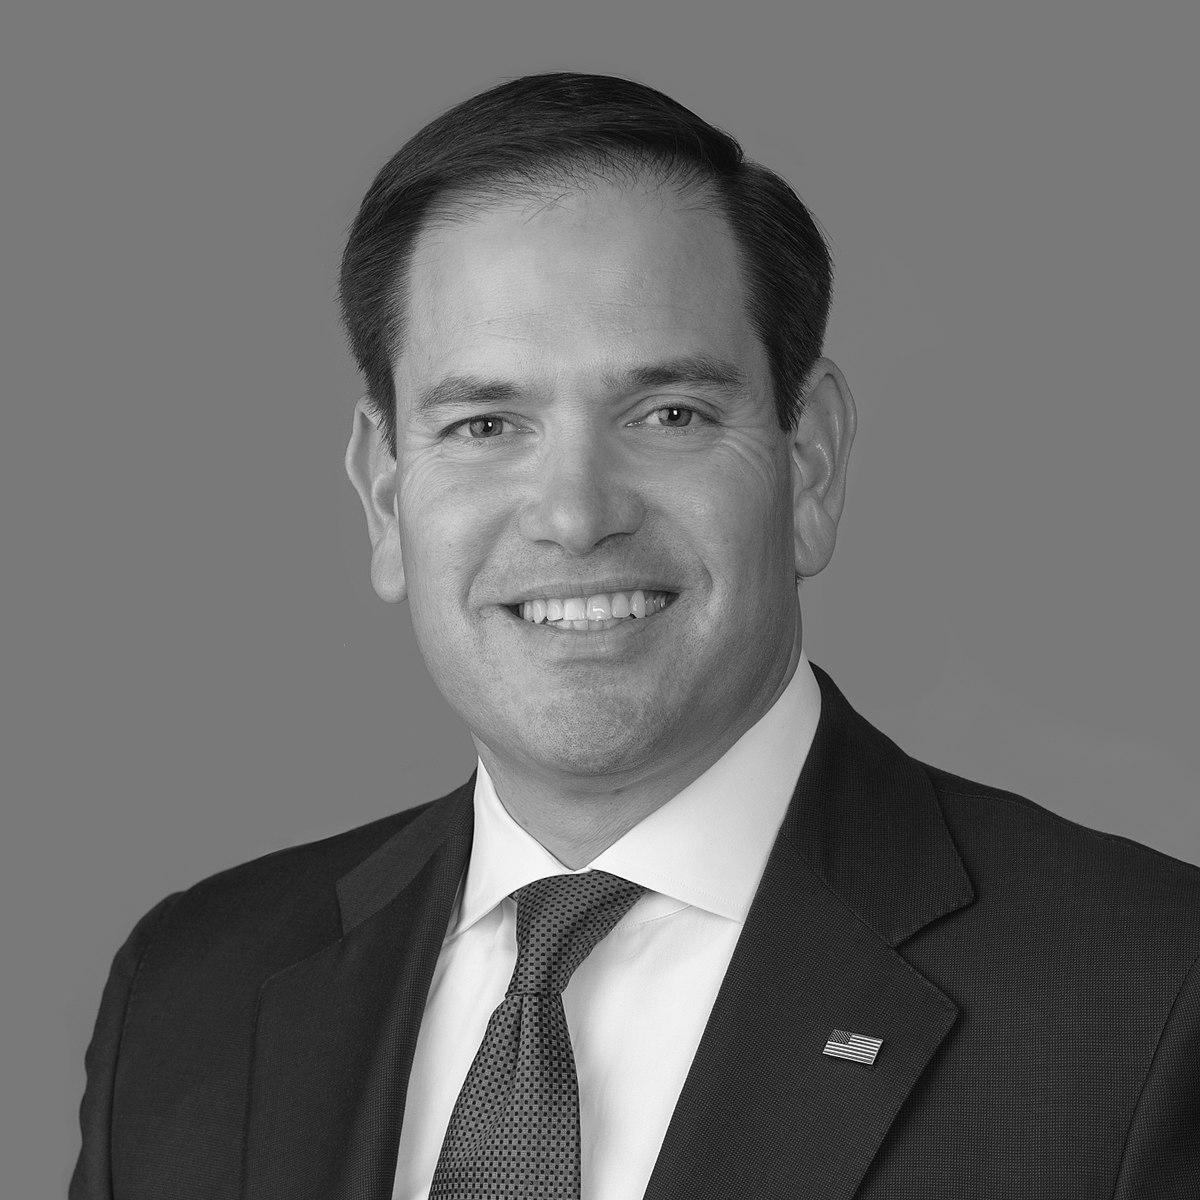 Sen. Marco Rubio   U.S. Senator for Florida